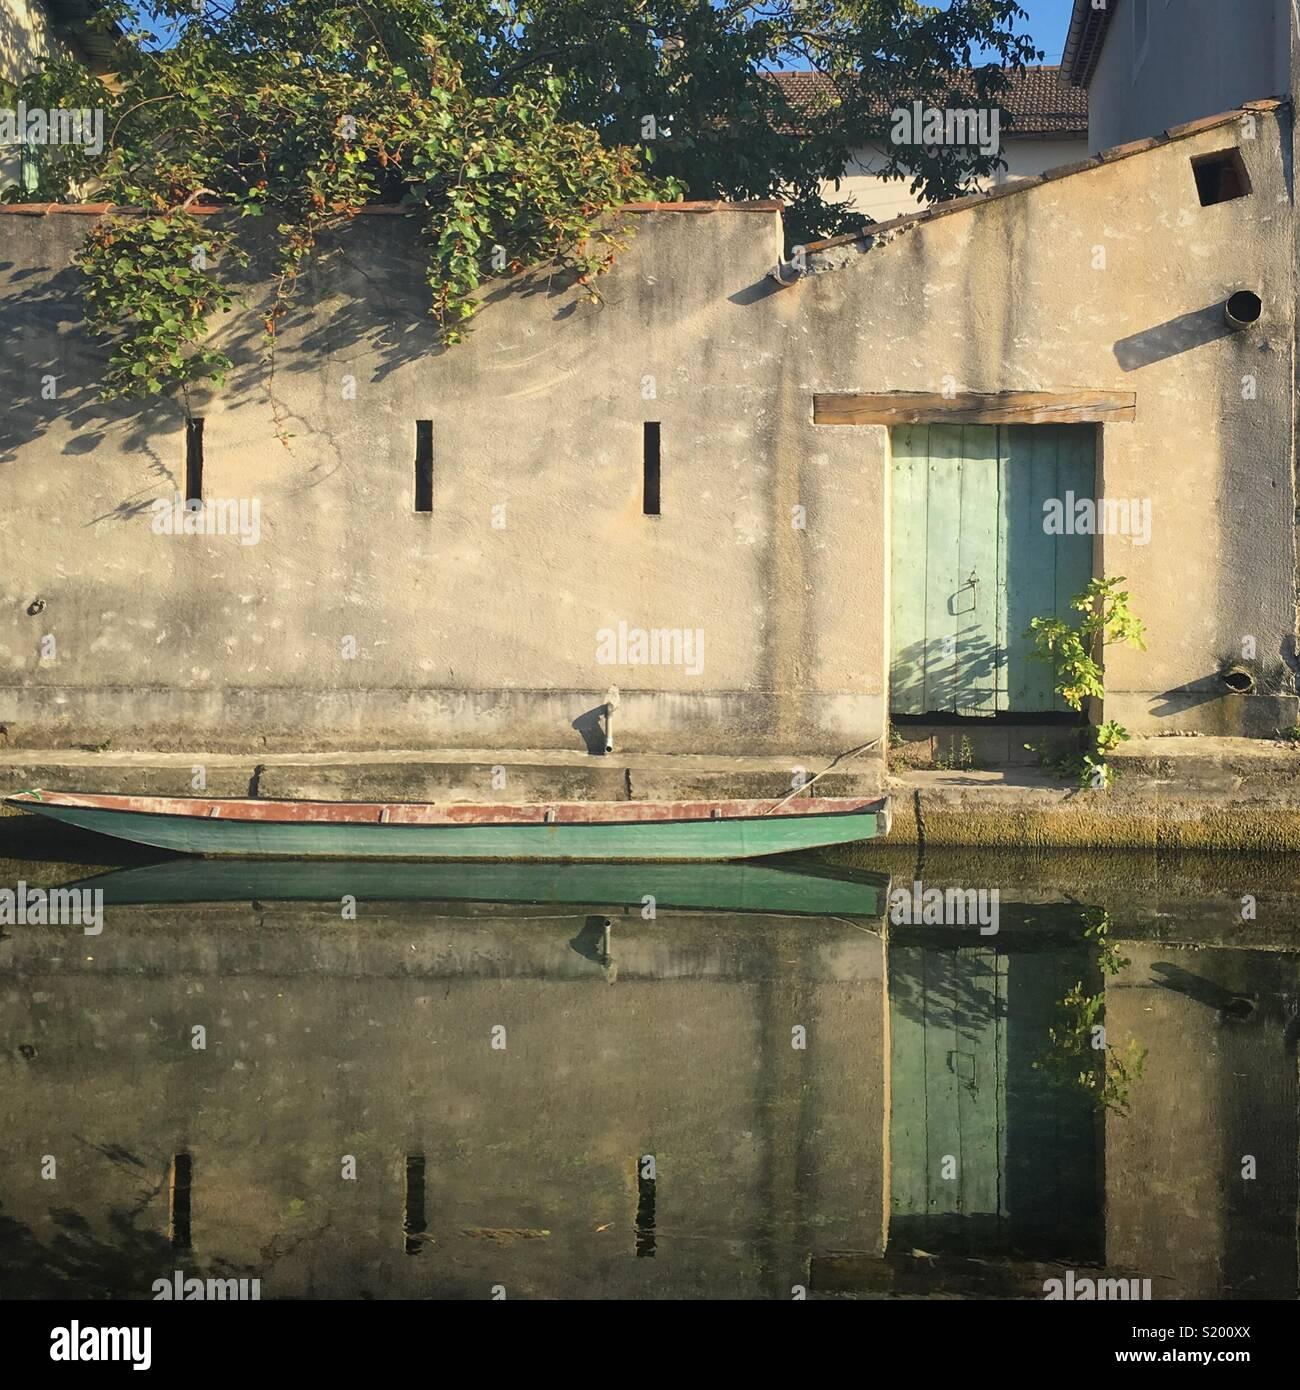 Un barco en el agua en L'Isle sur la Sorgue, Provenza, Francia Imagen De Stock